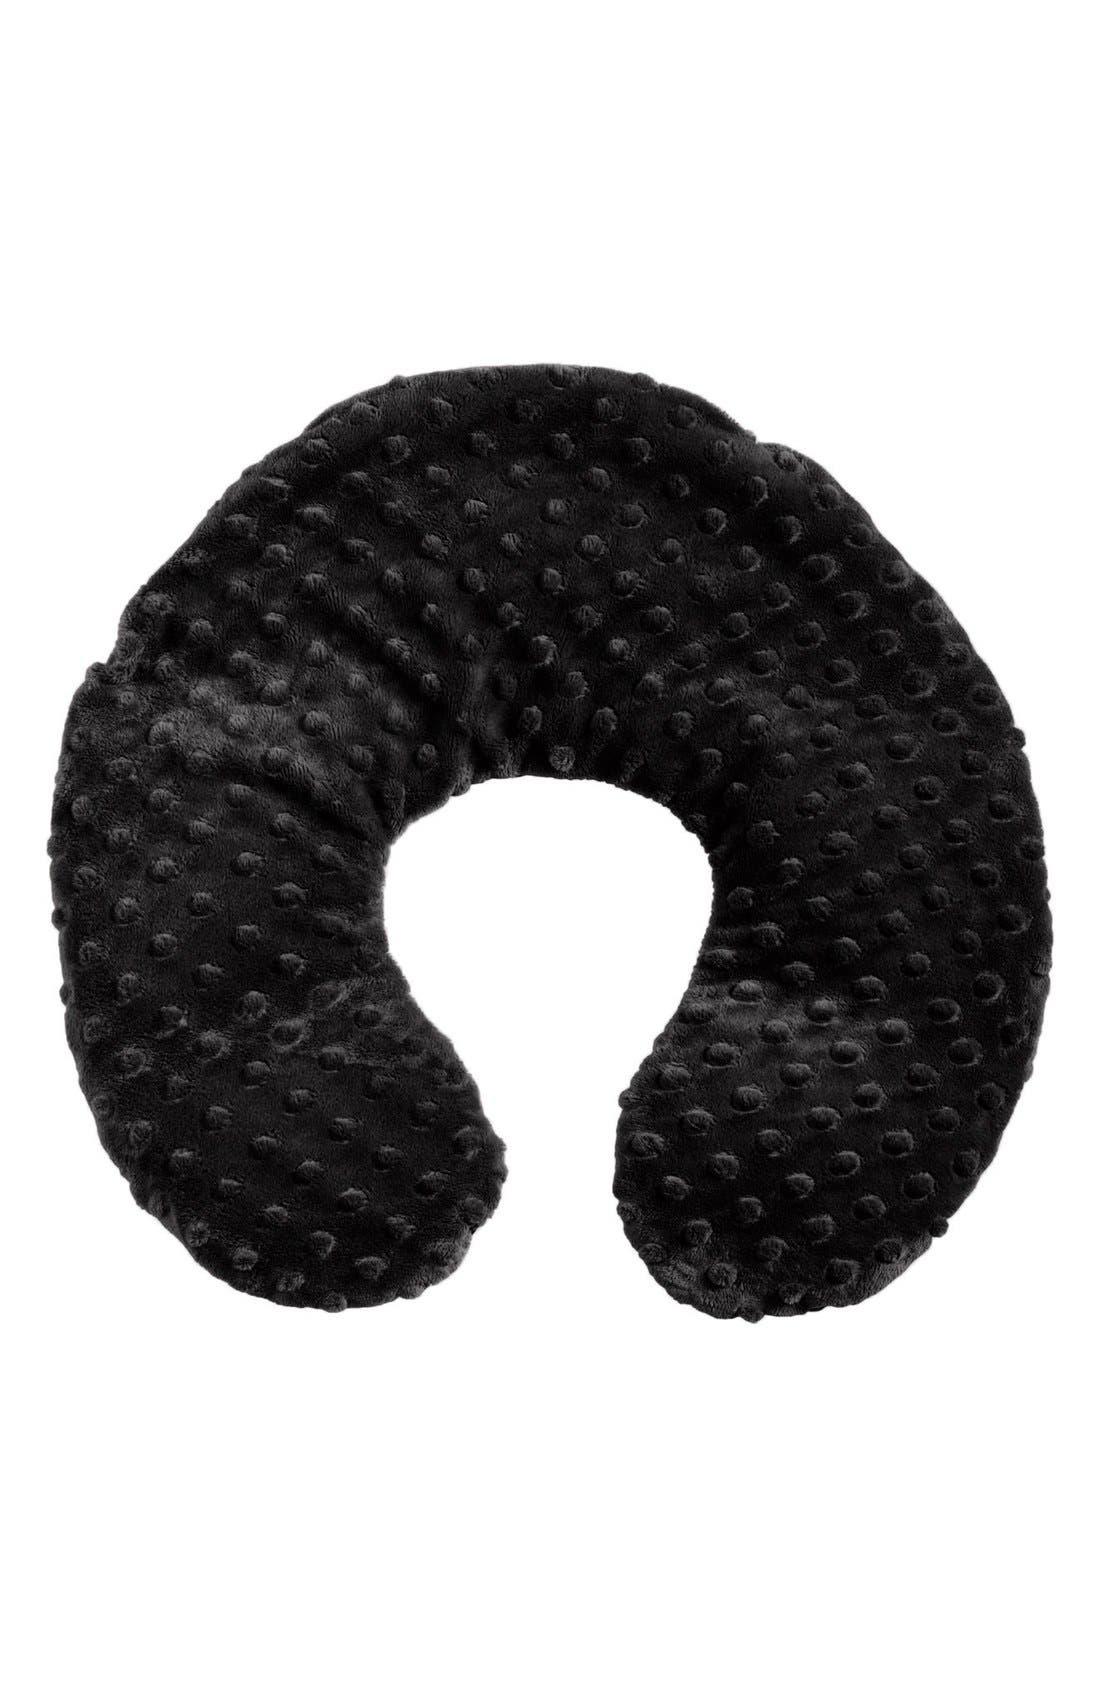 Main Image - Sonoma Lavender Black Dot Neck Pillow ($44 Value)